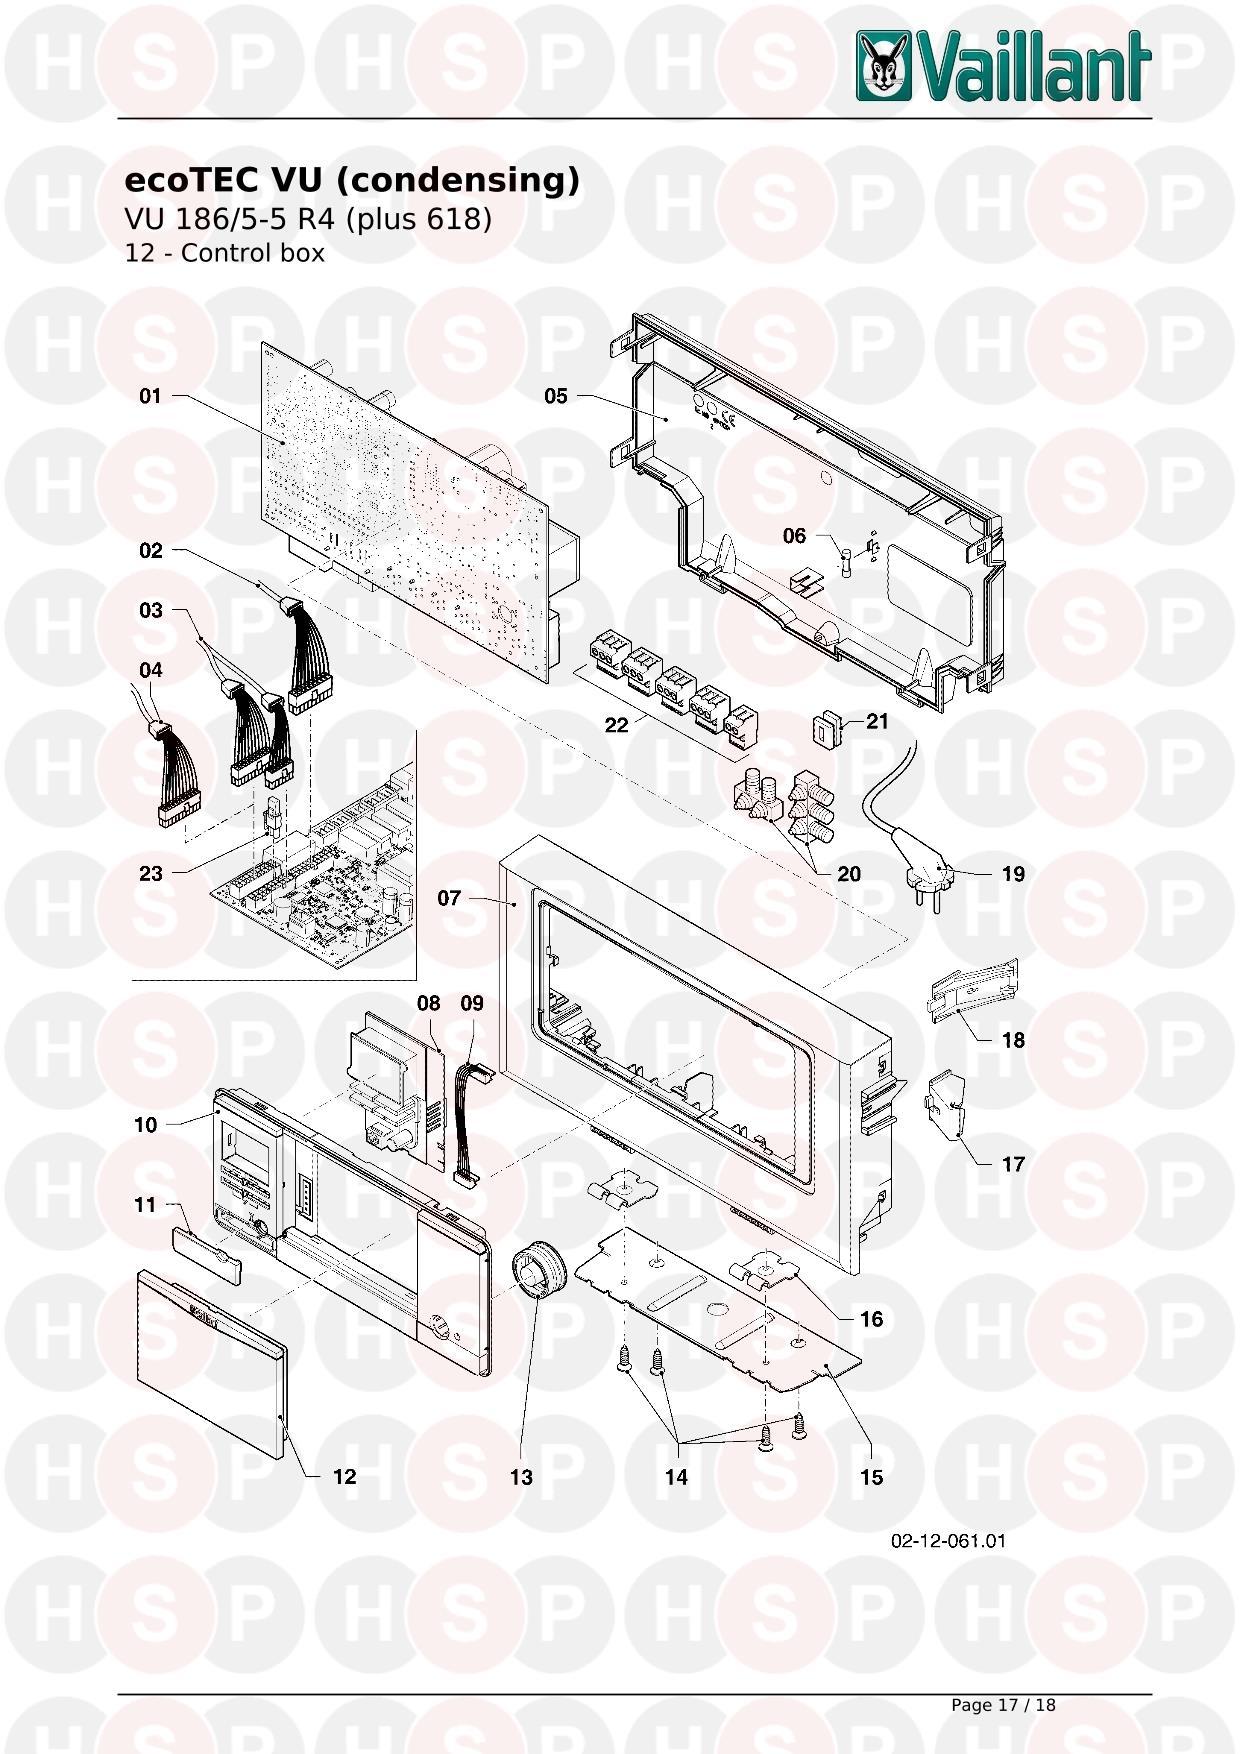 Vaillant ecotec plus 618 vu 1865 5 r4 2015 2015 lpg 12 control box 12 control box r4 diagram for vaillant ecotec plus 618 vu 1865 5 asfbconference2016 Gallery